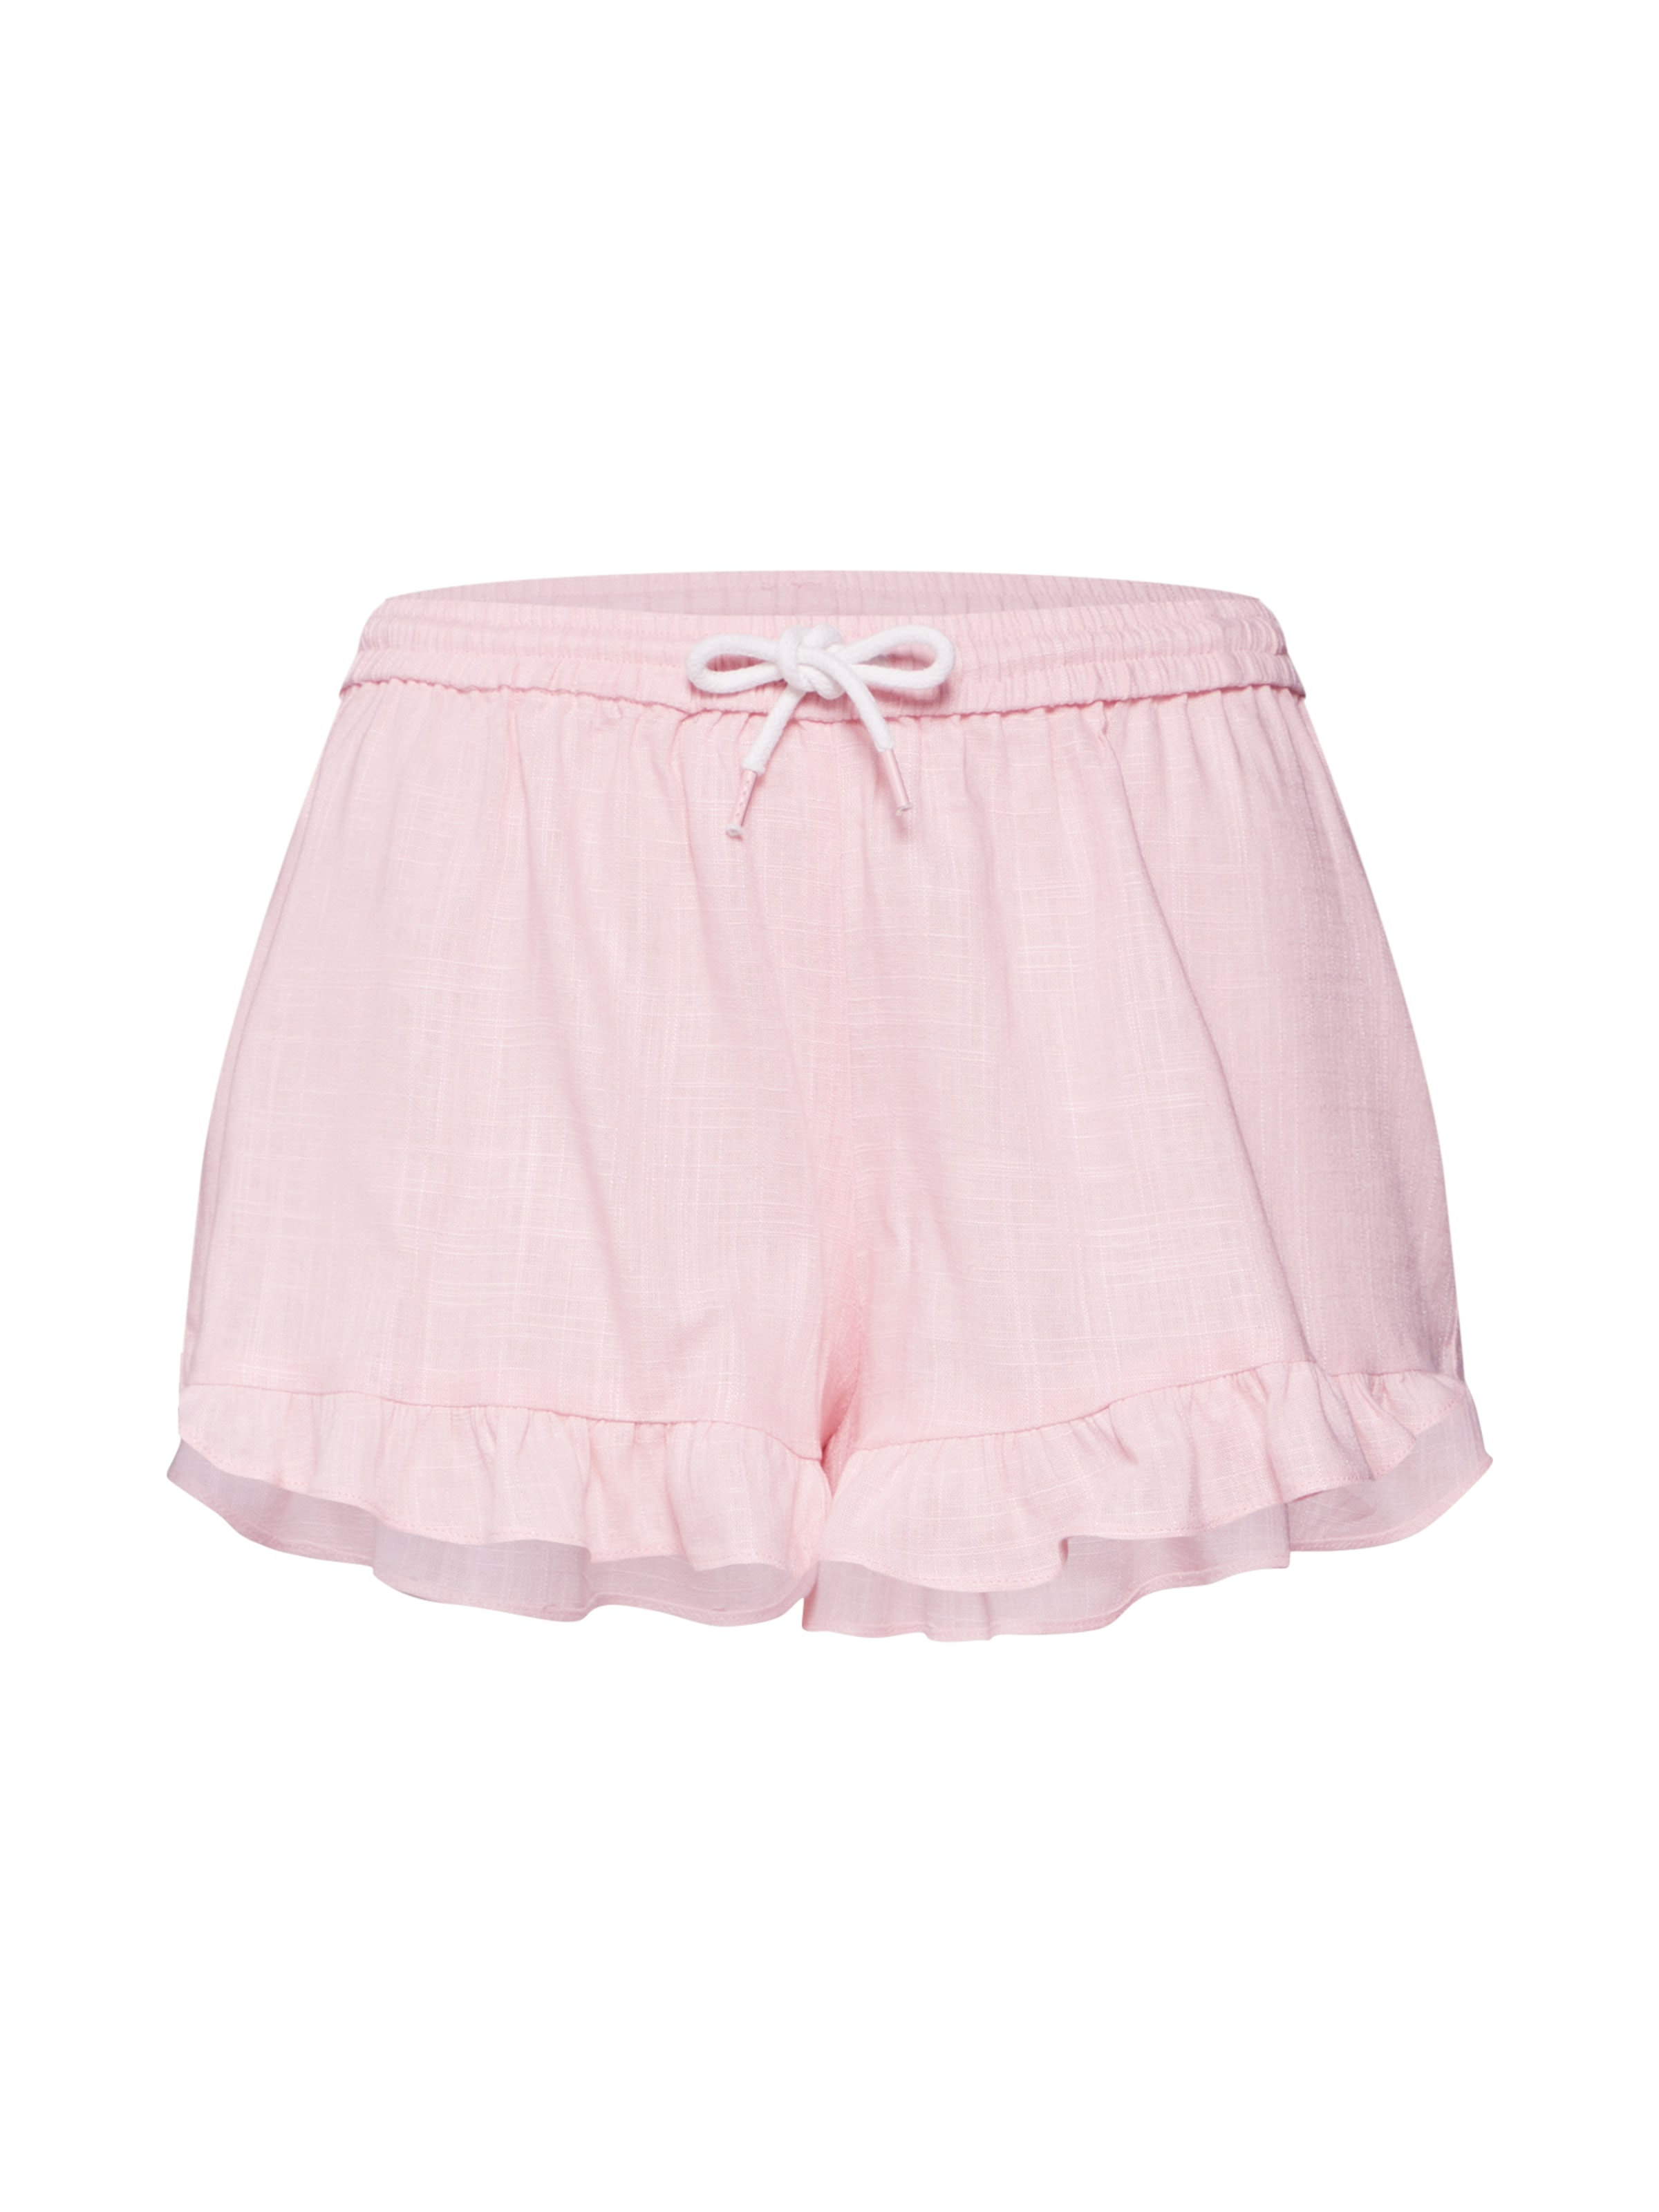 Pantalon Review 'frill Shorts' En Rose BeWdoxrC